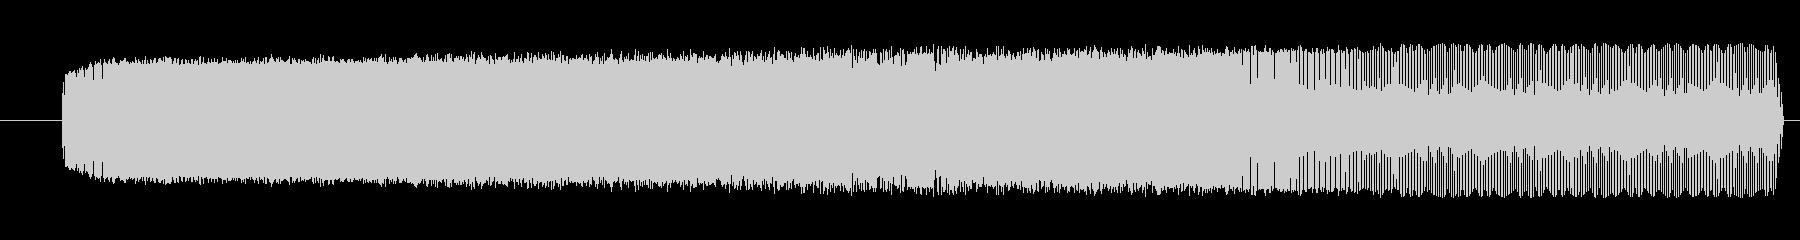 FX アーケードレーサー02の未再生の波形